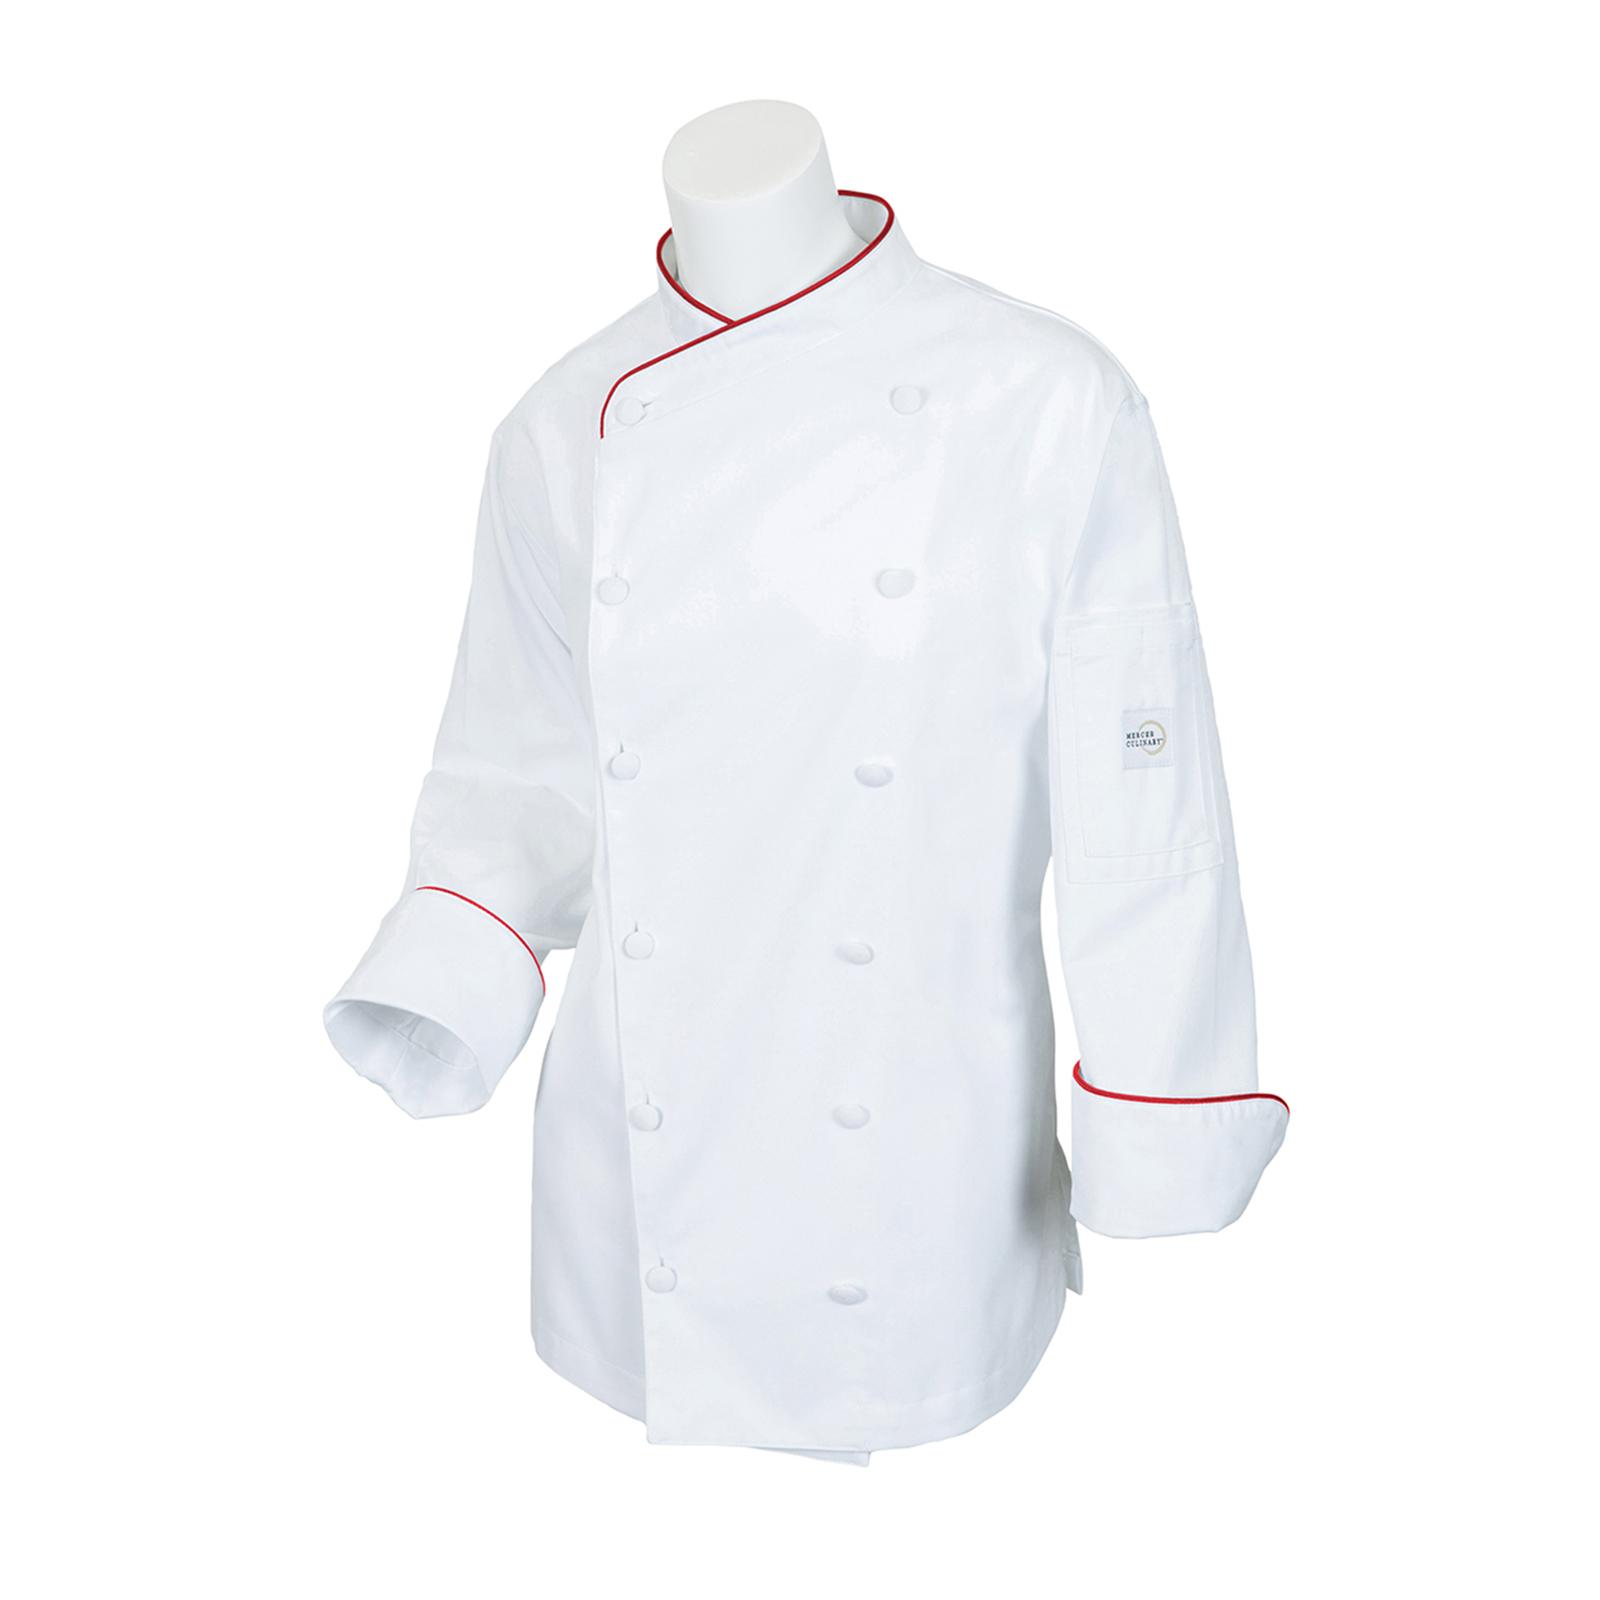 Mercer Culinary M62045WRXXS chef's coat